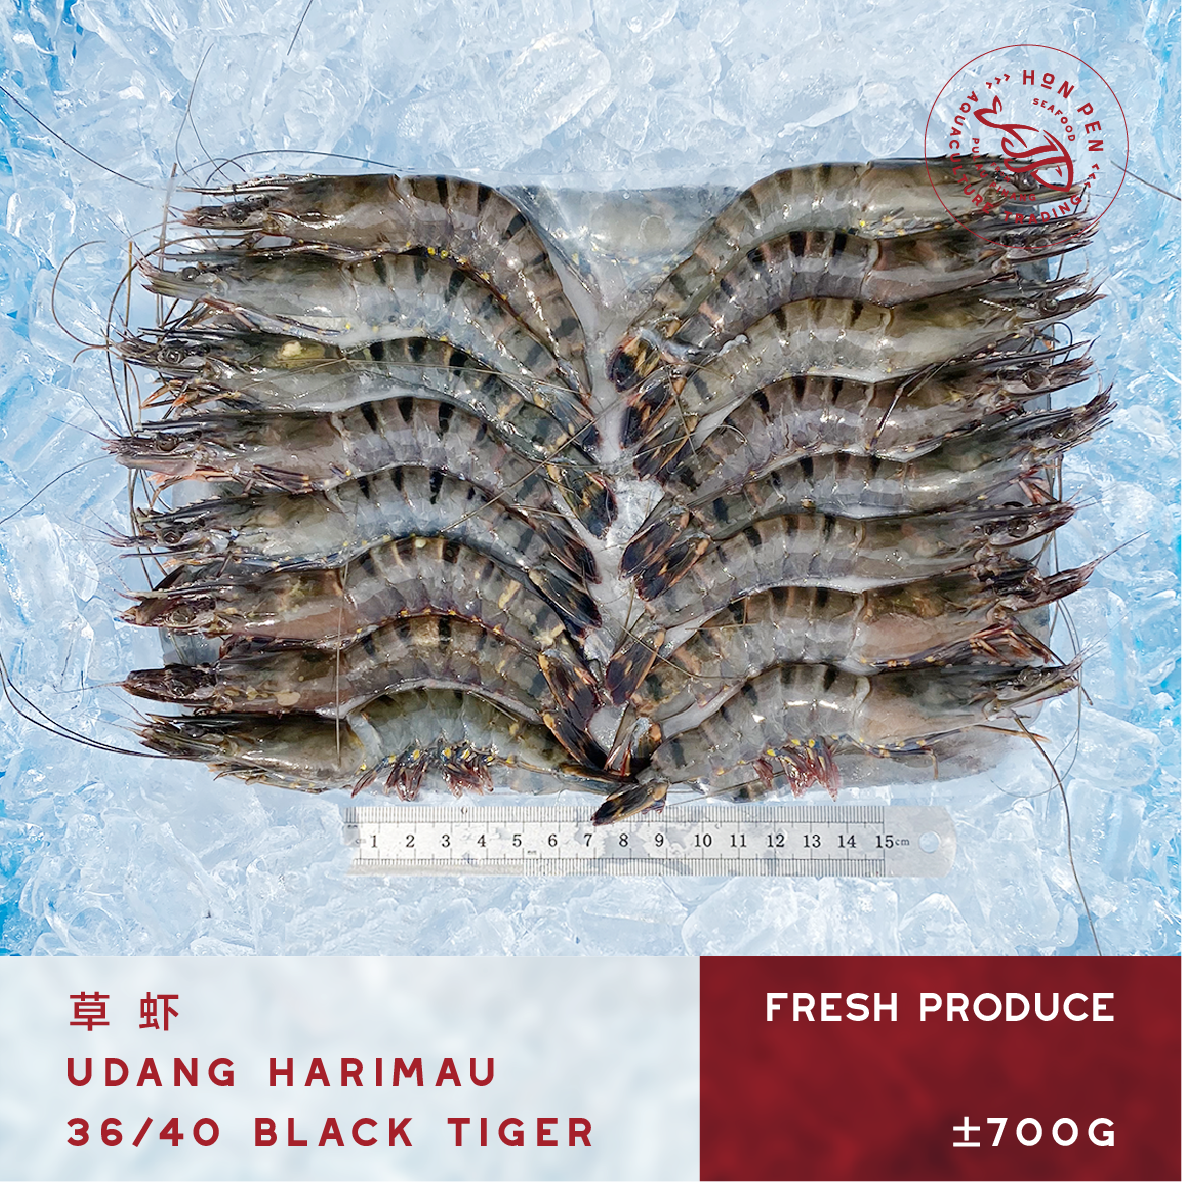 BLACK TIGER 36/40 草虾 UDANG HARIMAU (Seafood) ±700g